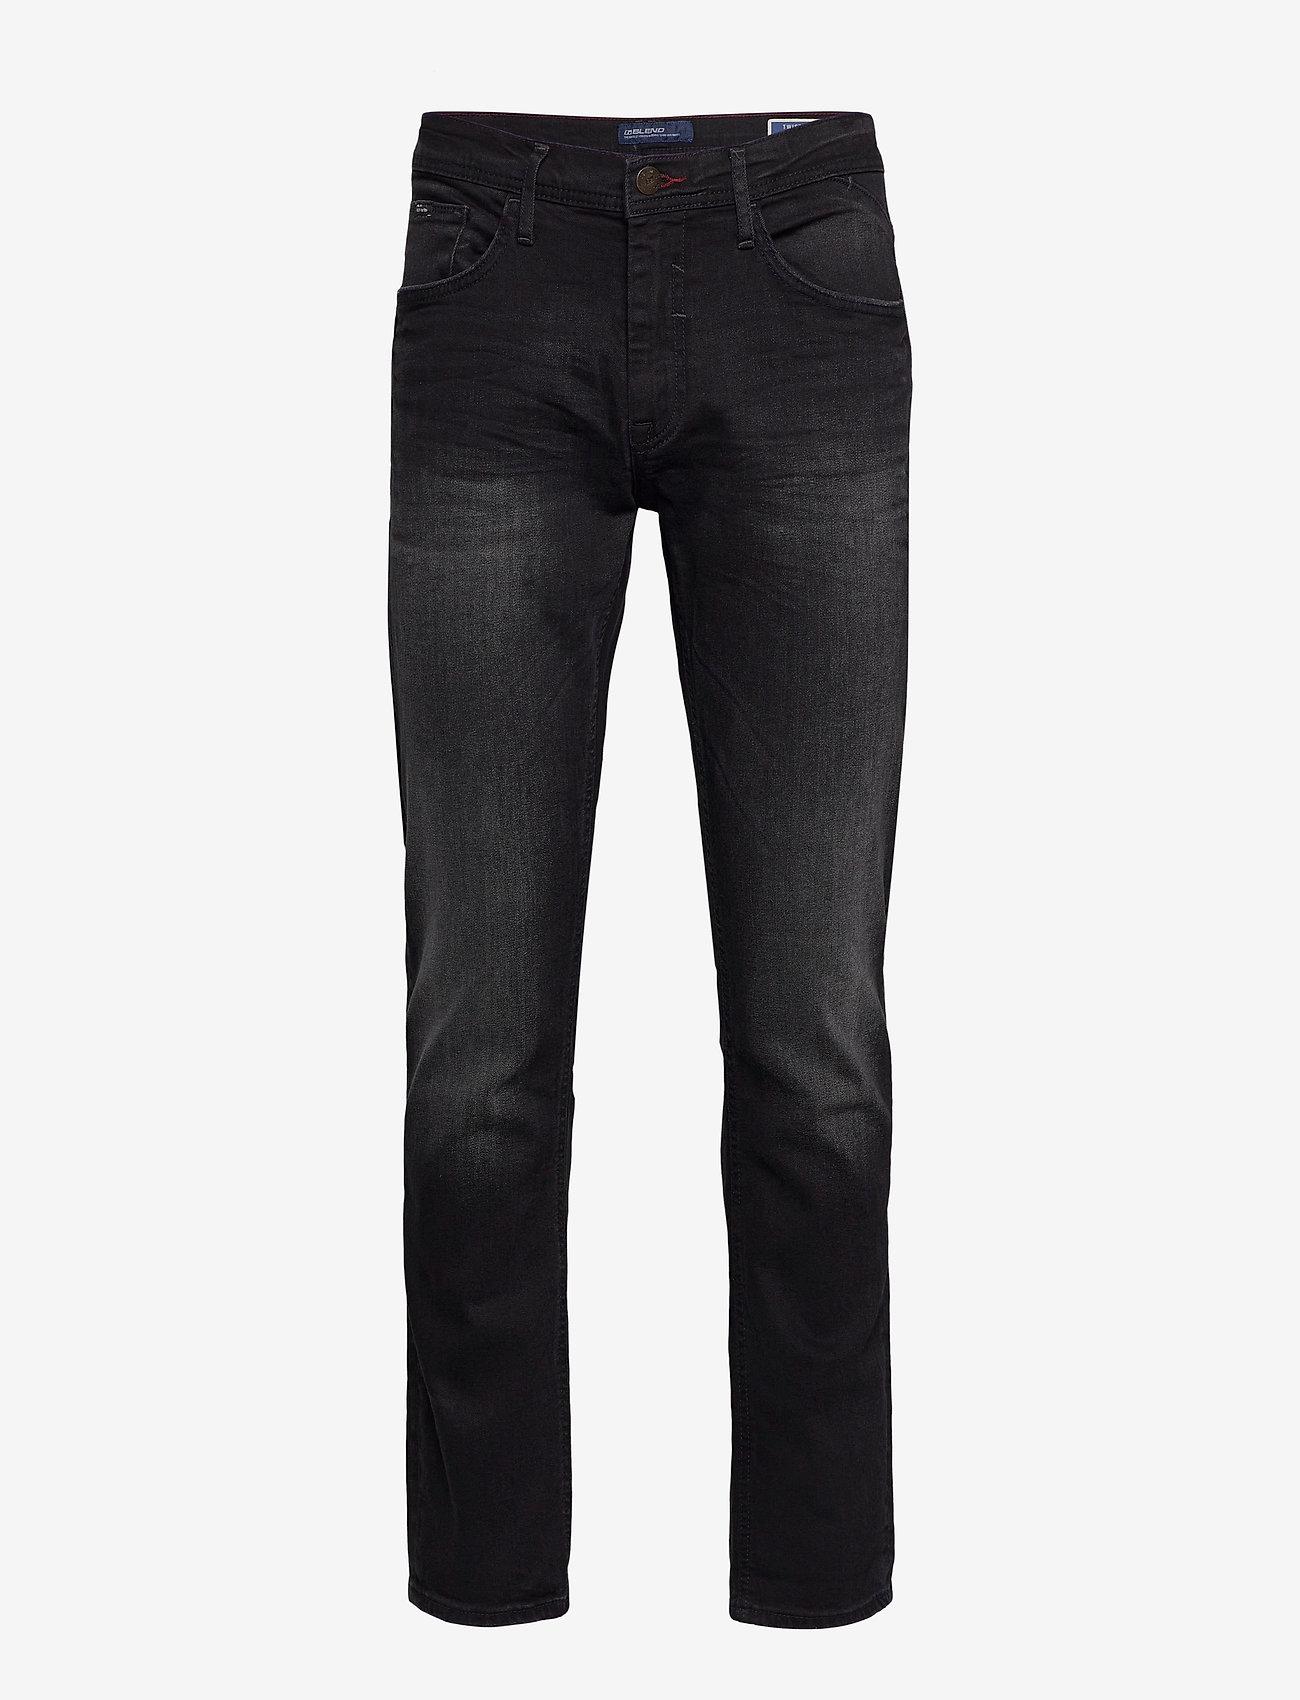 Blend - Jeans - Clean - slim jeans - denim black - 0